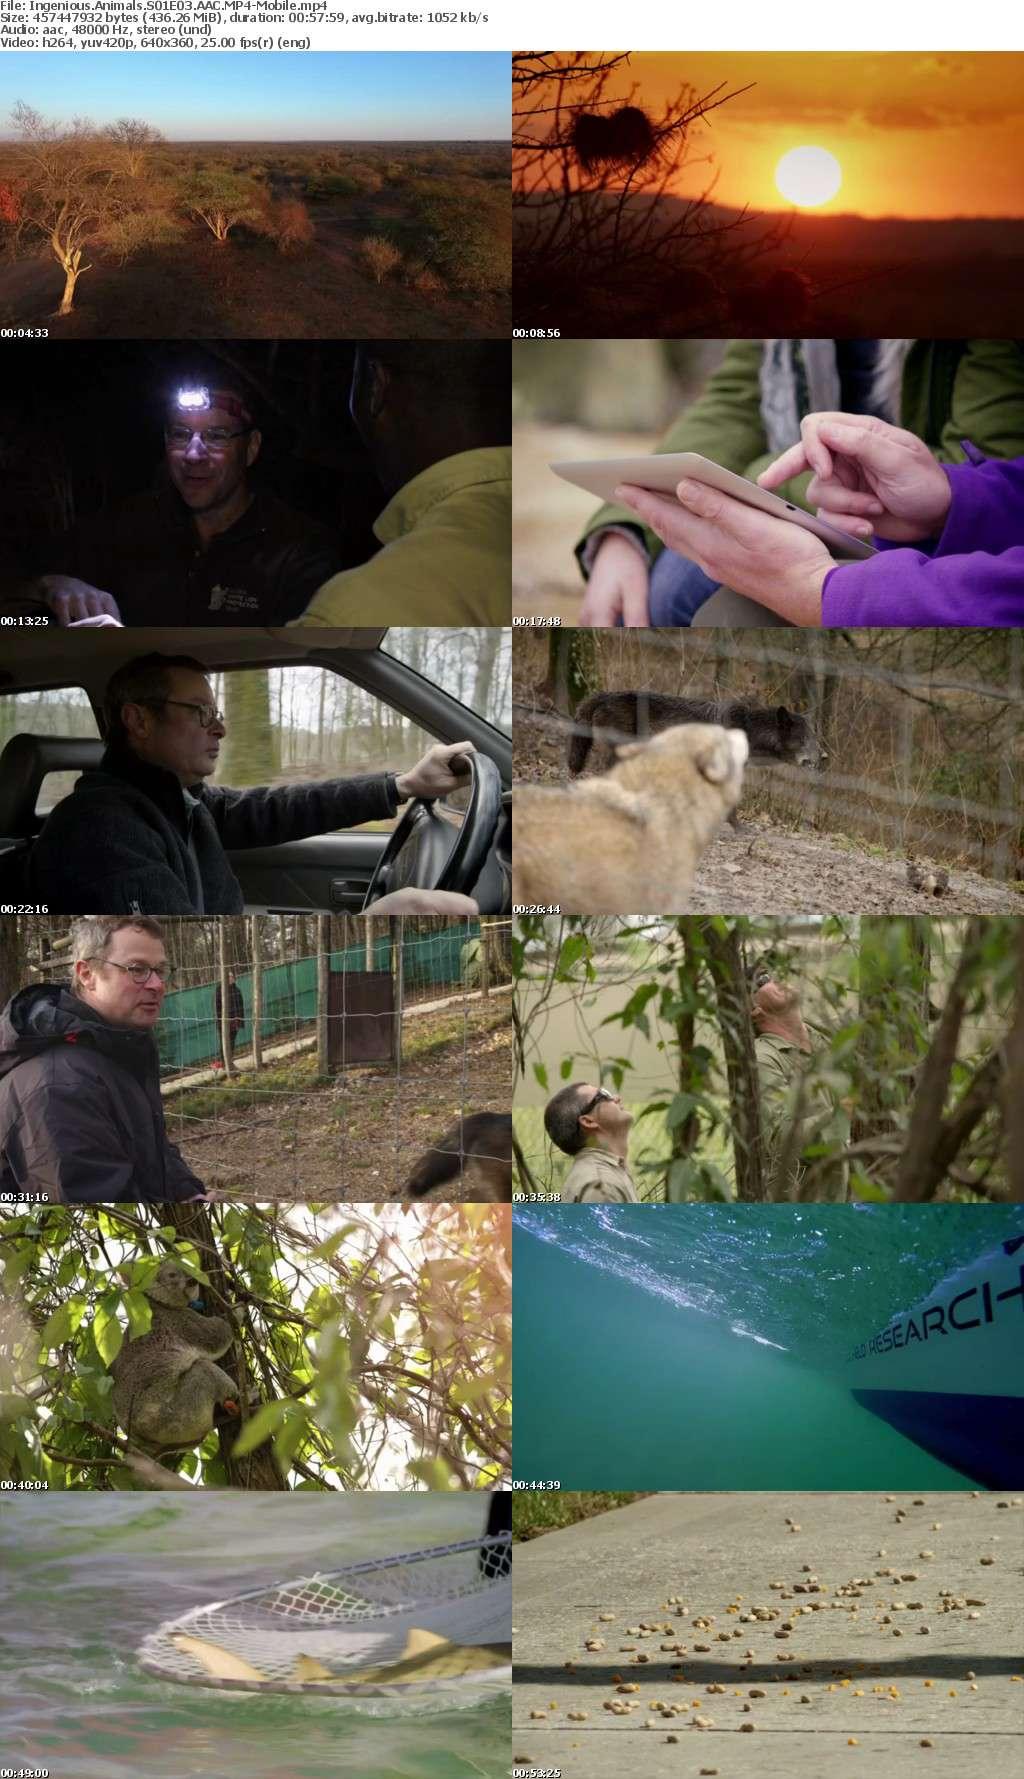 Ingenious Animals S01E03 AAC-Mobile